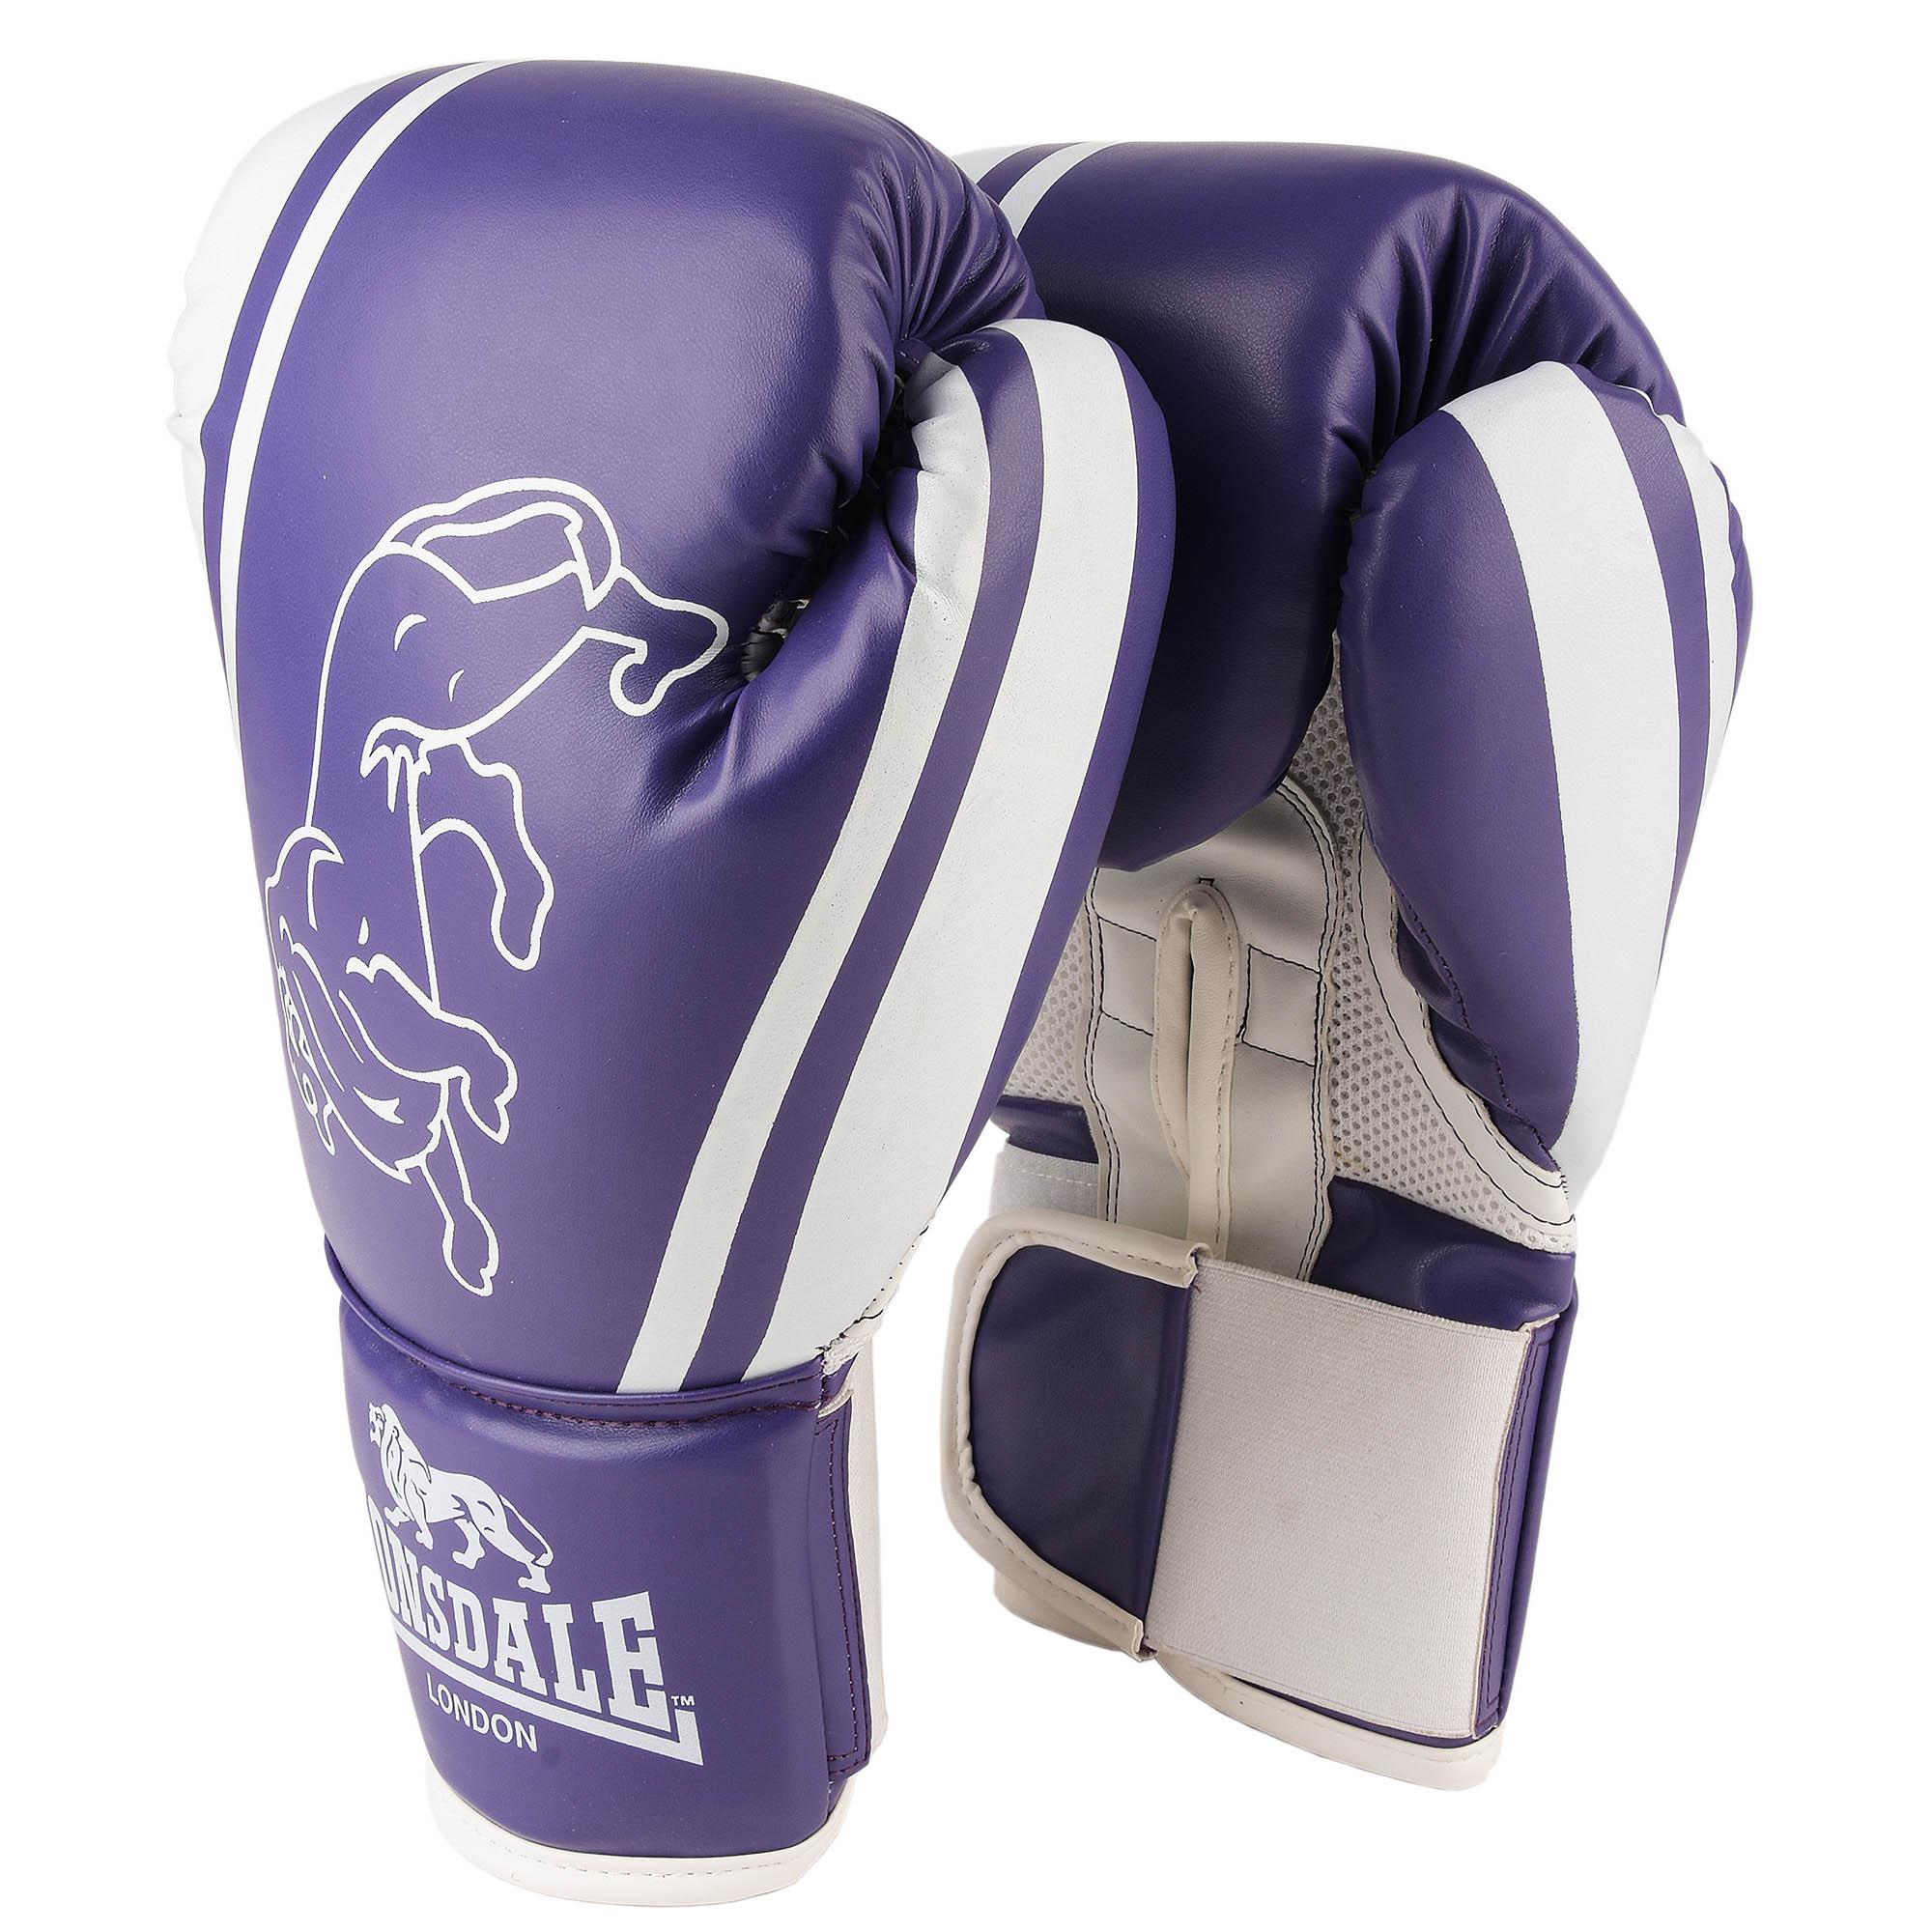 Lonsdale Club Training Gloves - Purple, 10oz